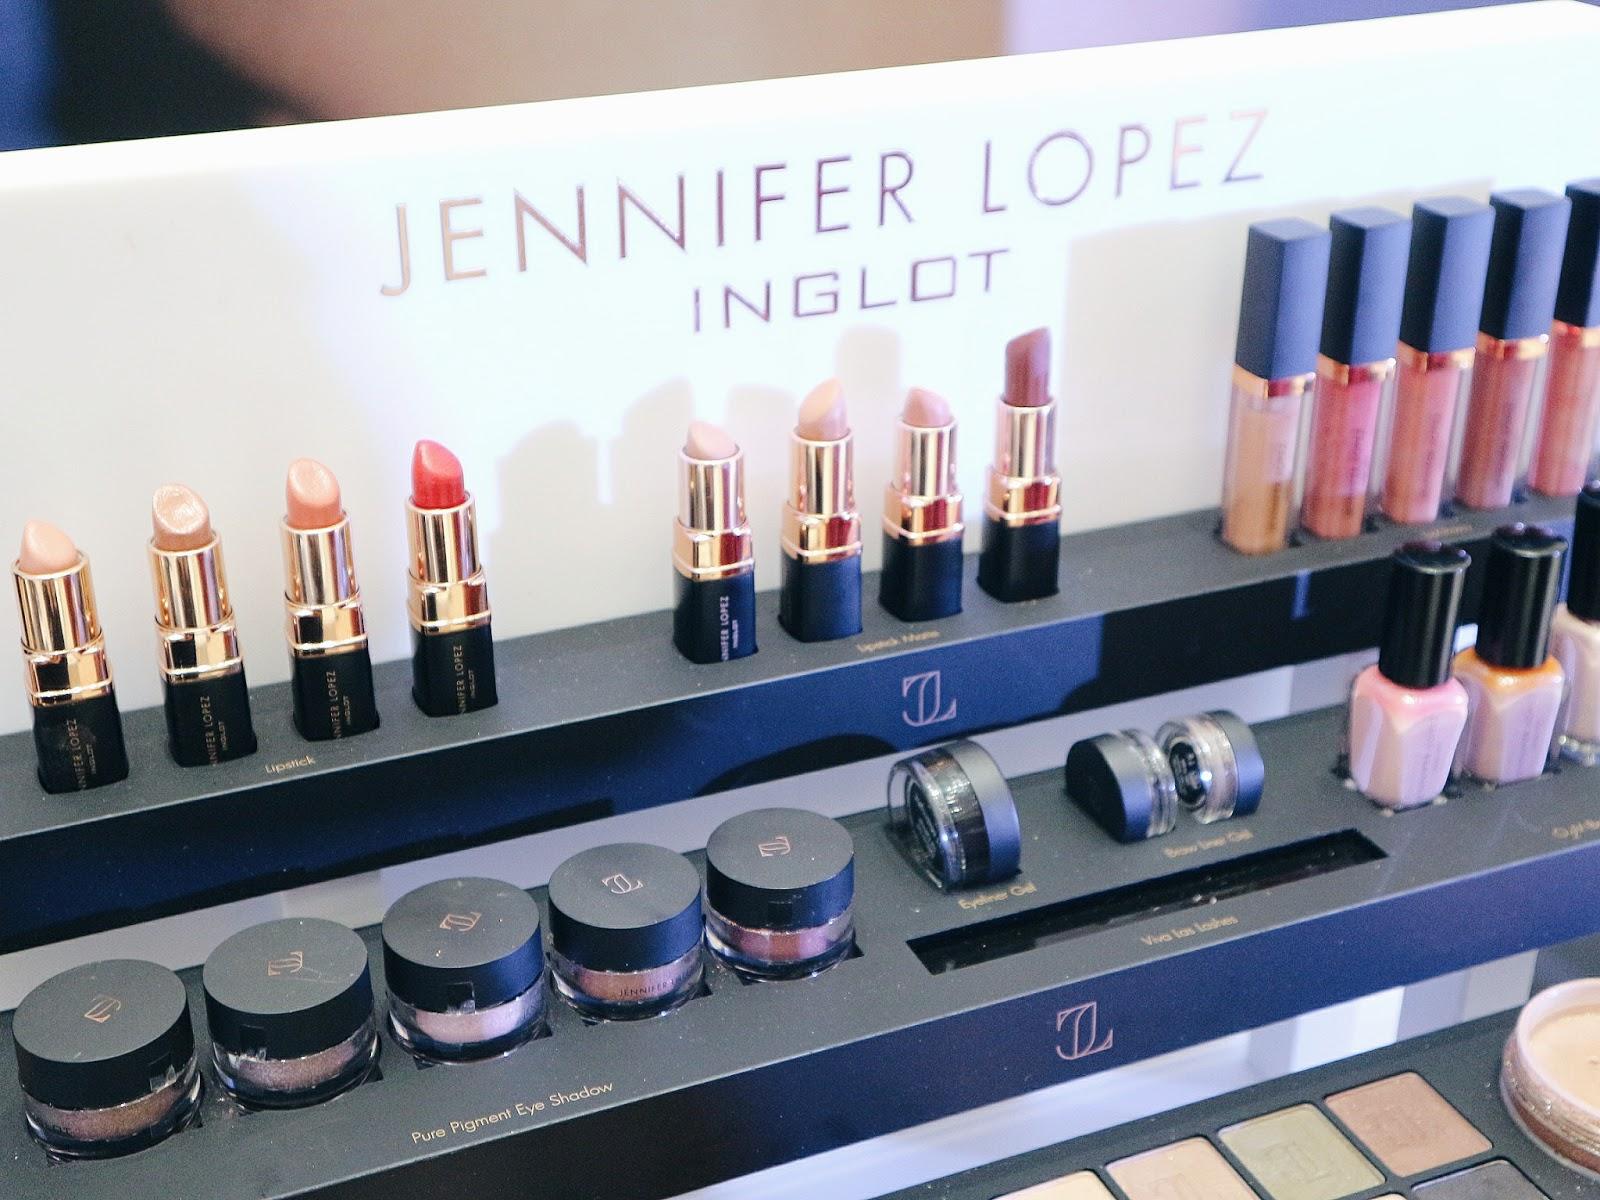 Jennifer Lopez Lipstick Inglot Cosmetics Makeup collection